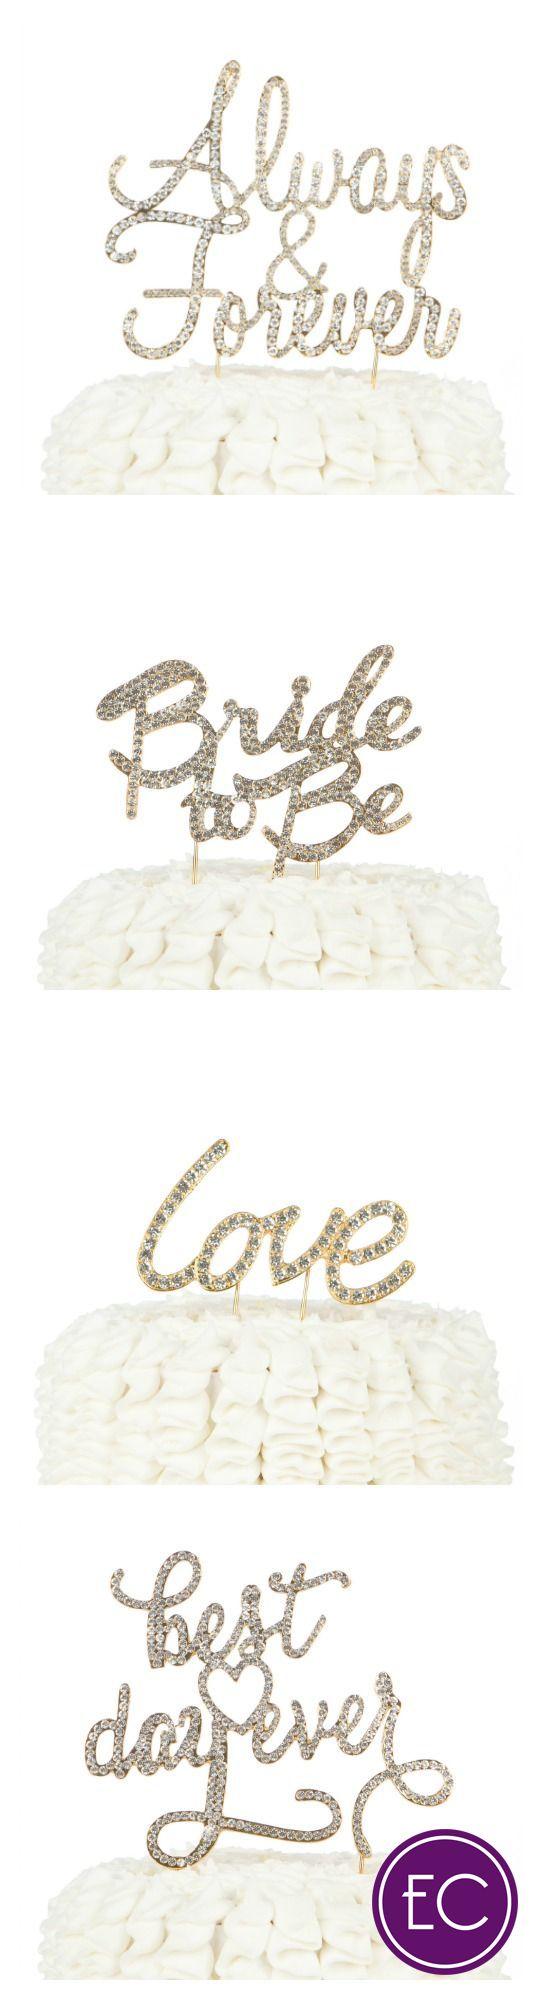 Beautiful gold rhinestone wedding cake toppers